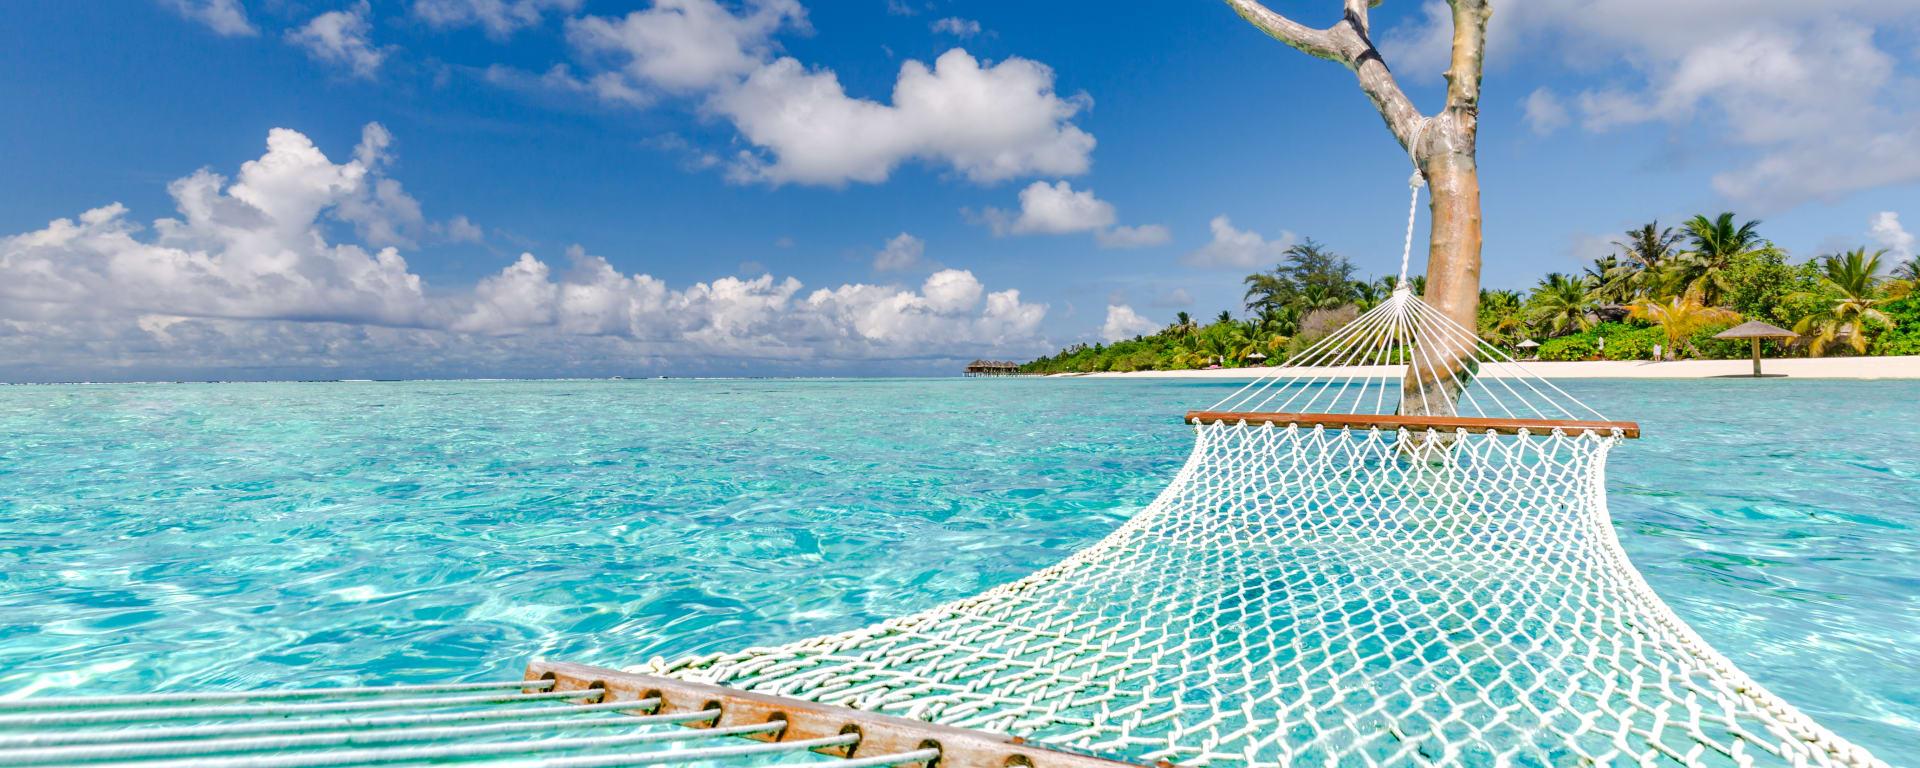 Malediven entdecken mit Tischler Reisen: Malediven Insel Meer Haengematte